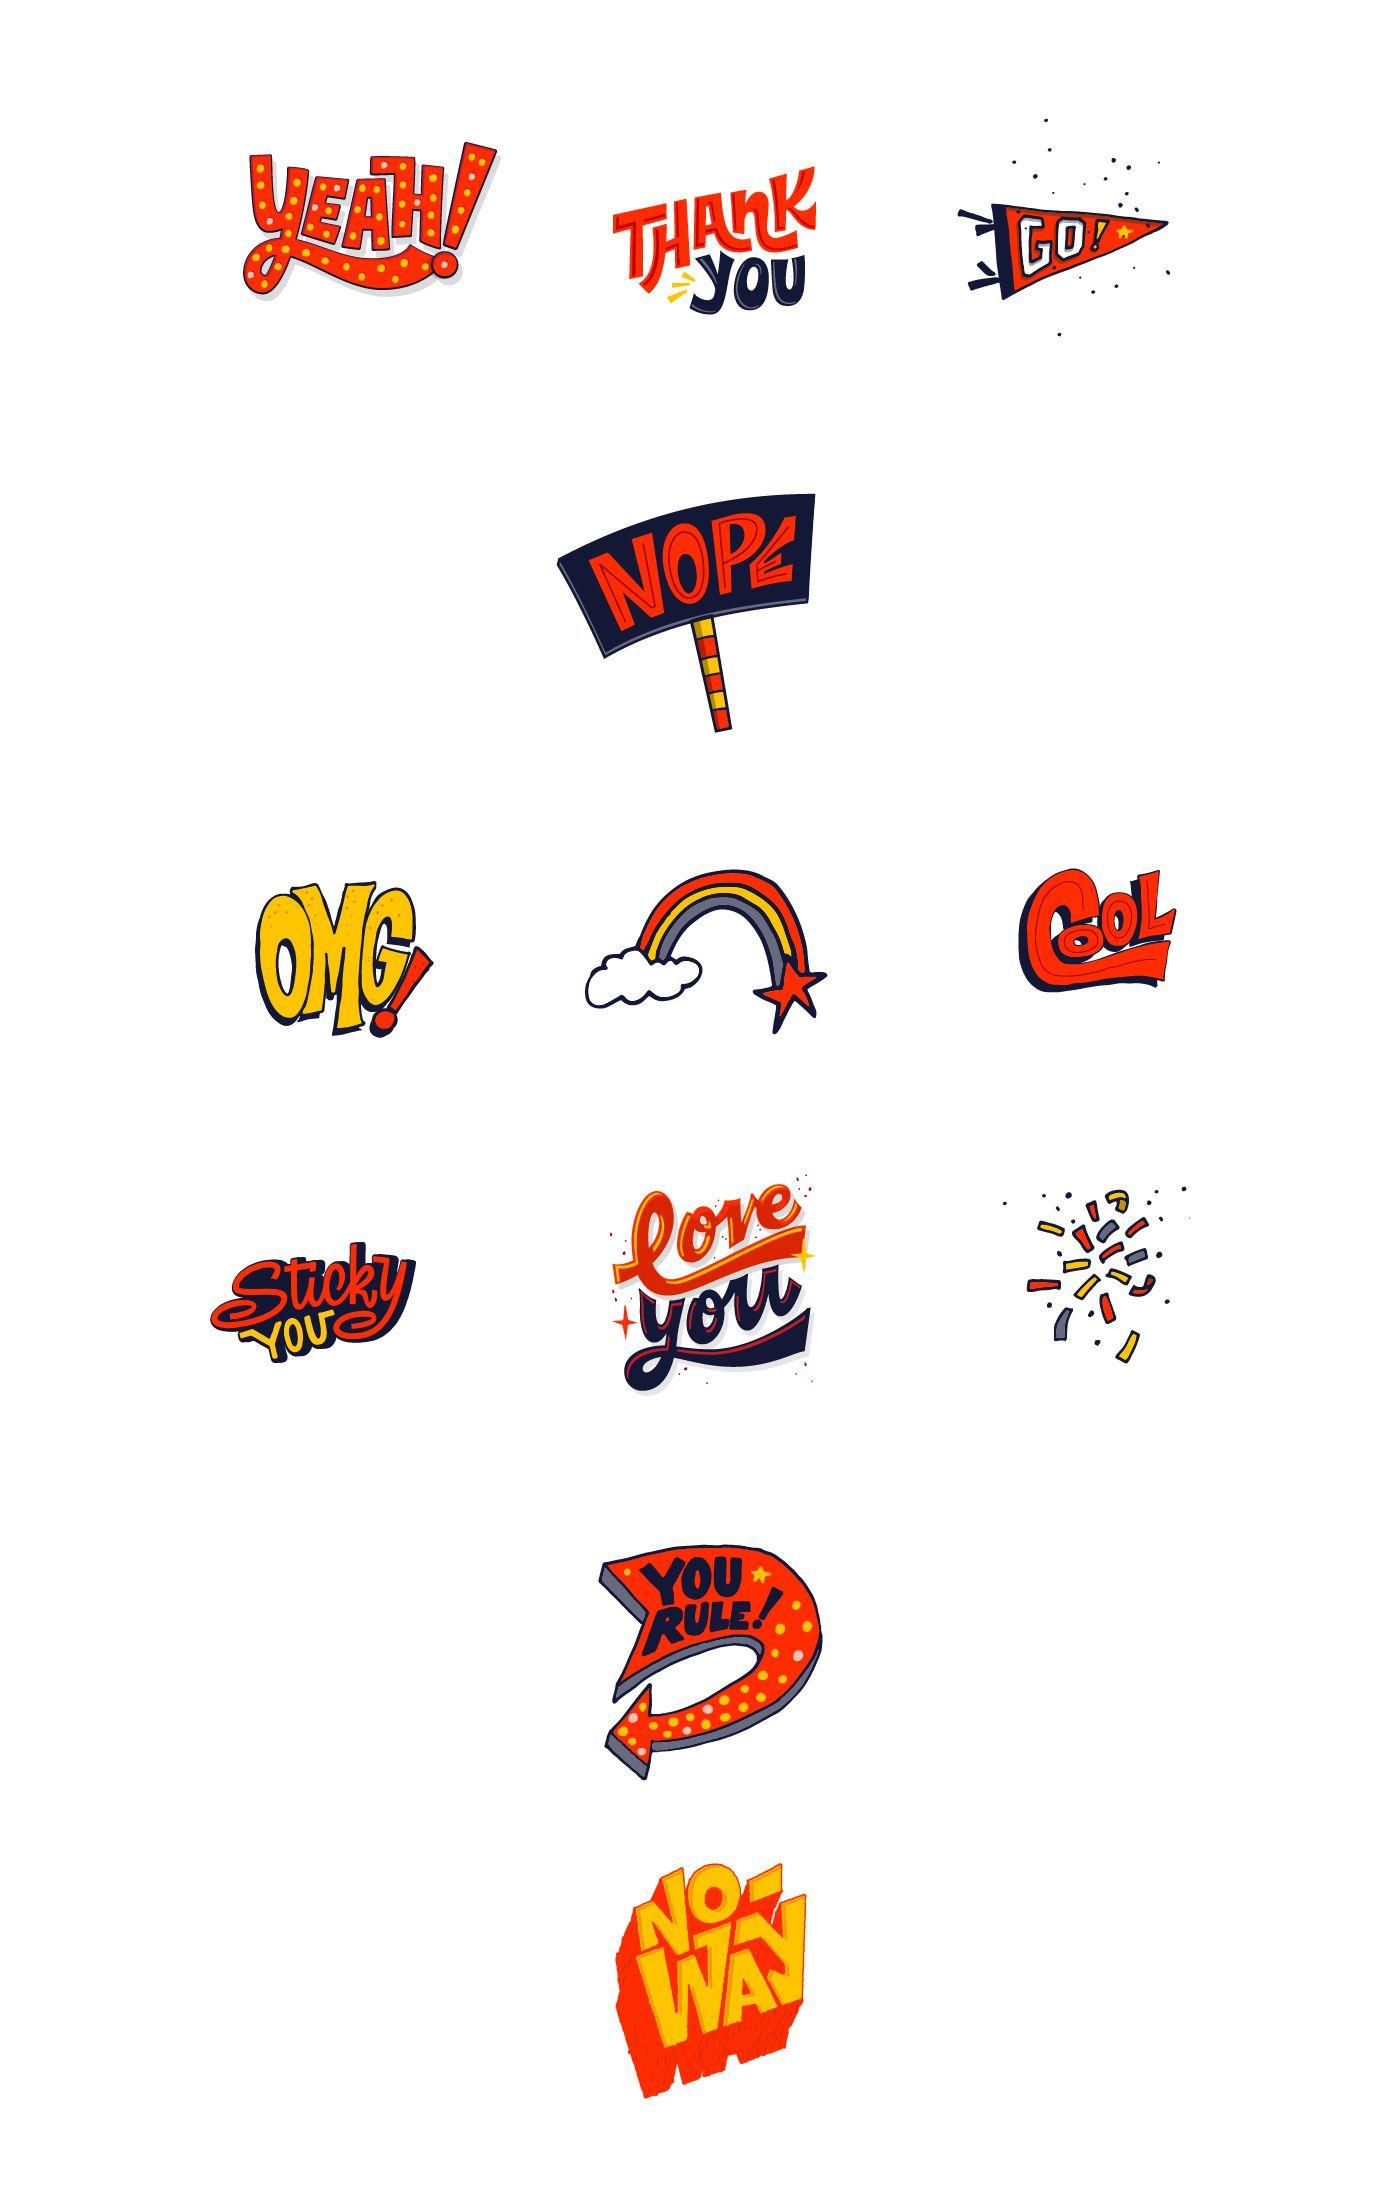 Bla Bla iMessage Stickers on Behance 插画, 画